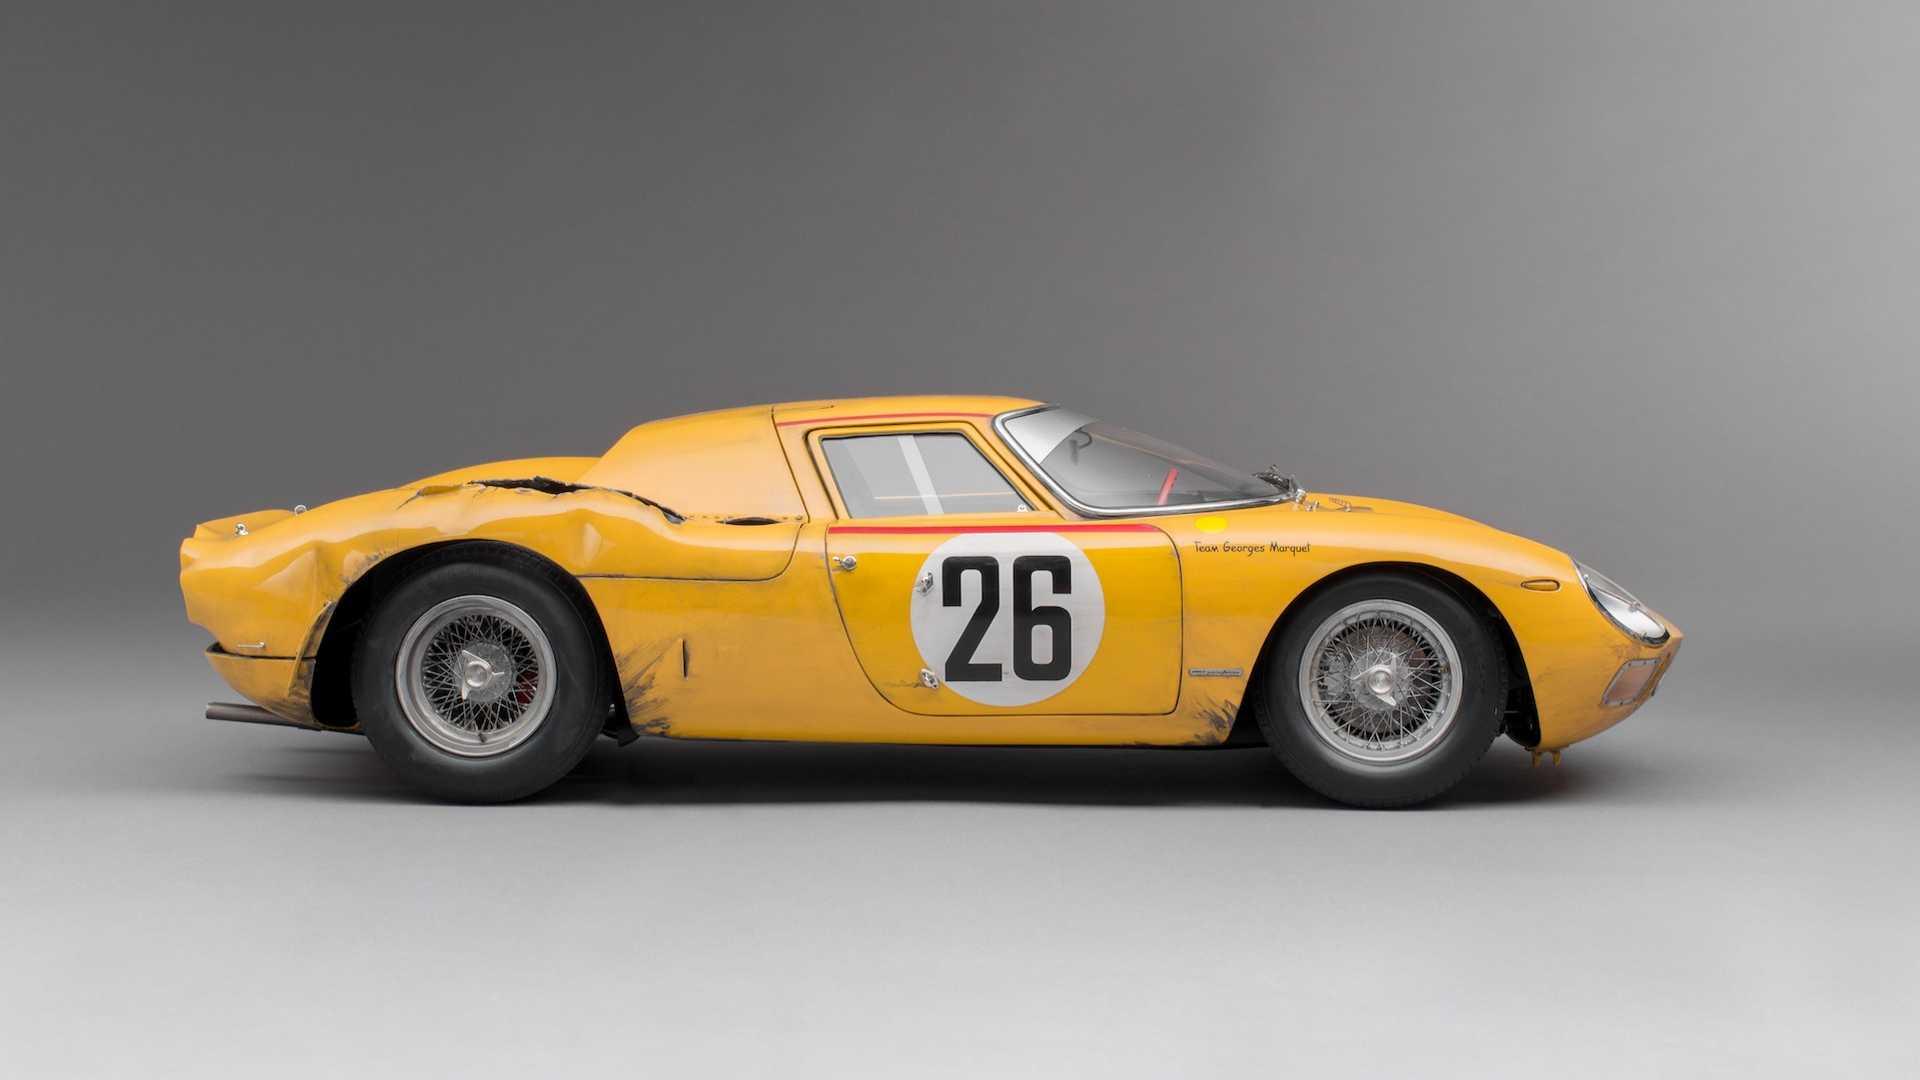 Amalgam представил коллекционную Ferrari 250 LM 2